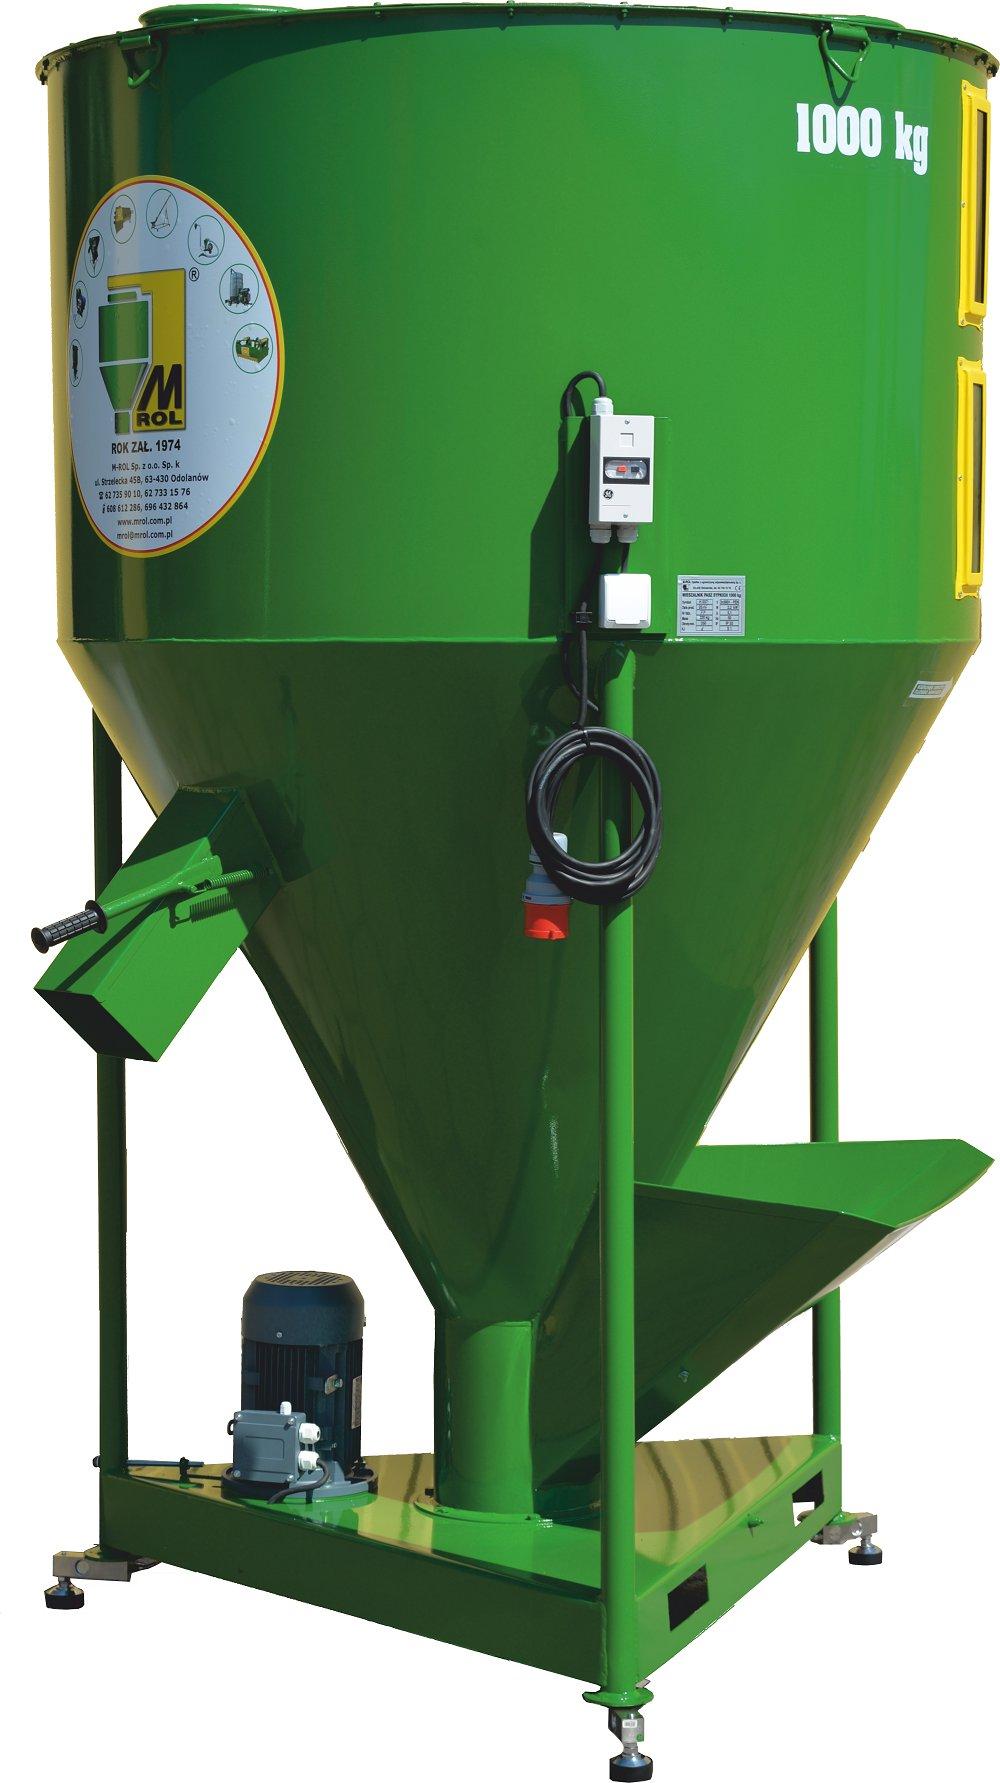 Mixér krmiva 1500kg výrobcu M-ROL HIT